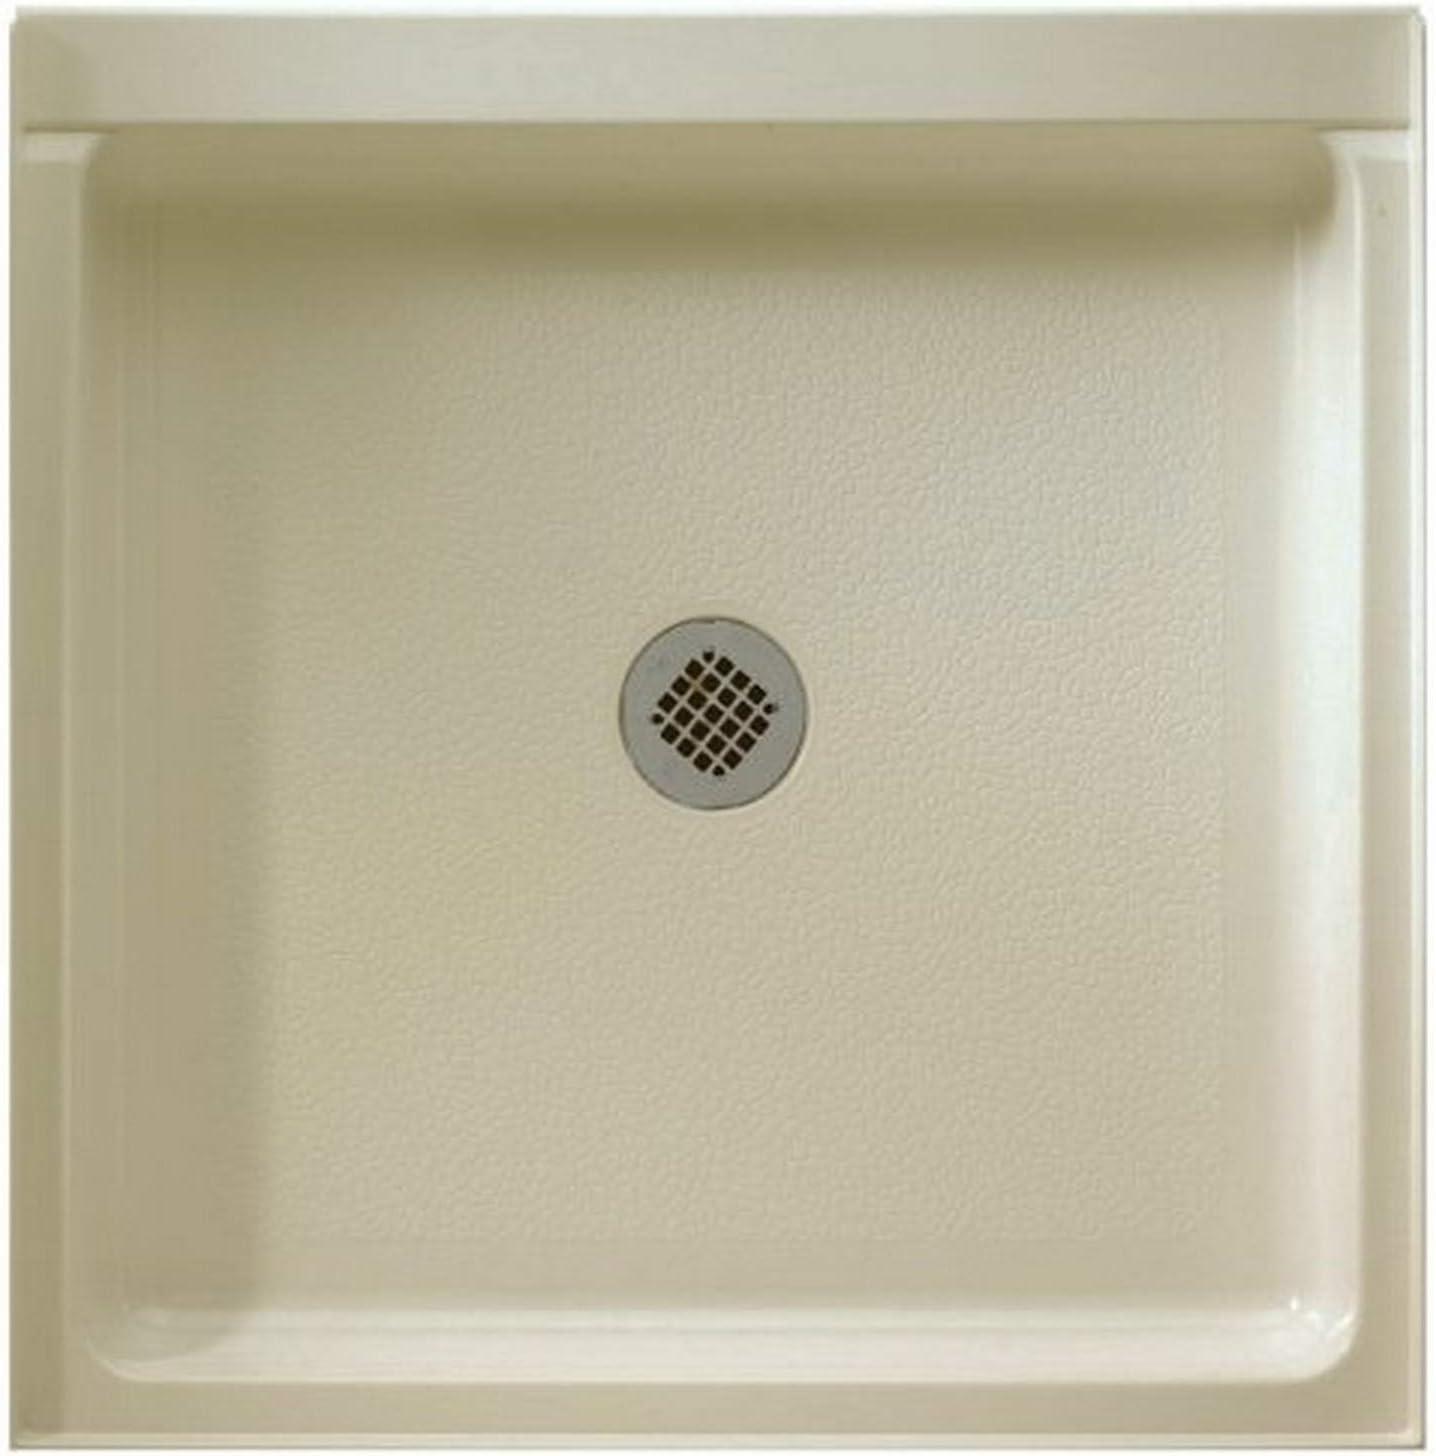 Swanstone Challenge the lowest price of Japan ☆ FF04236MD.037 Veritek Max 44% OFF Center Shower Drain Base 42-in